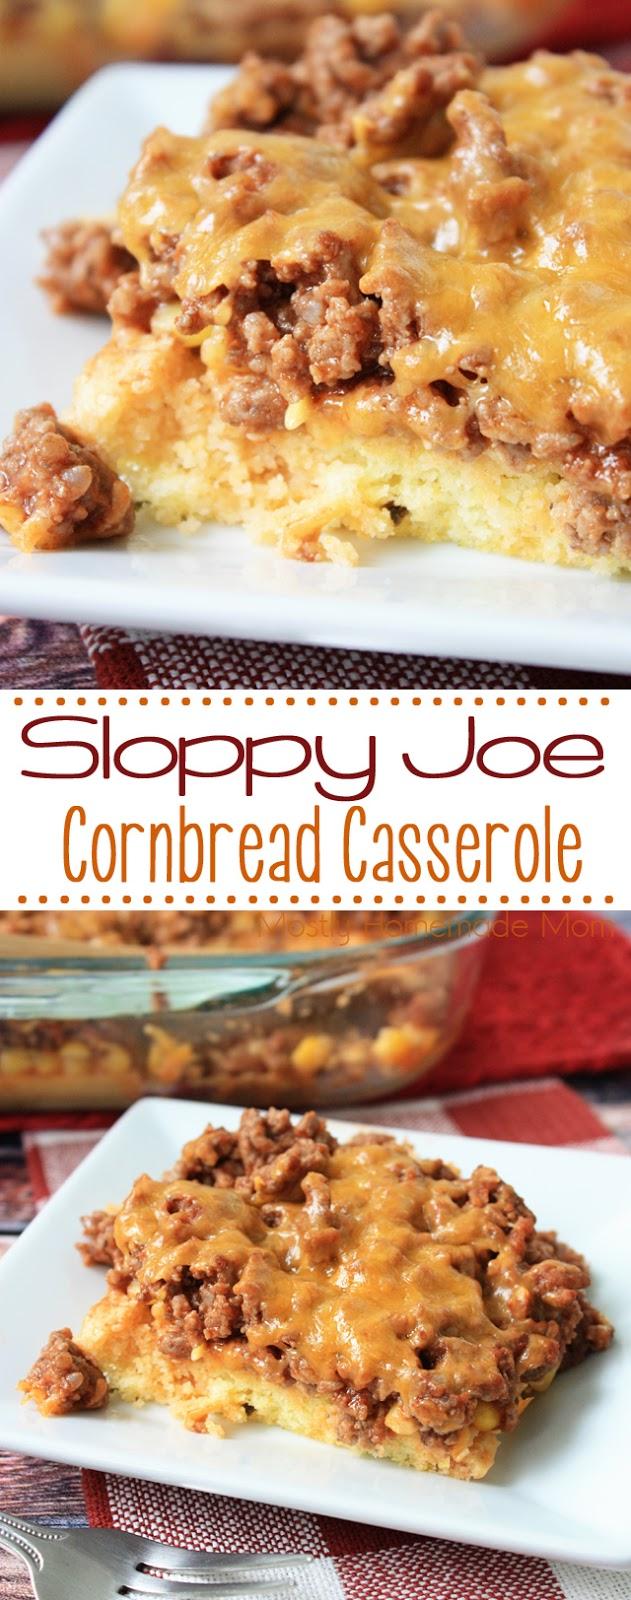 Cornbread Casserole with Sloppy Joes